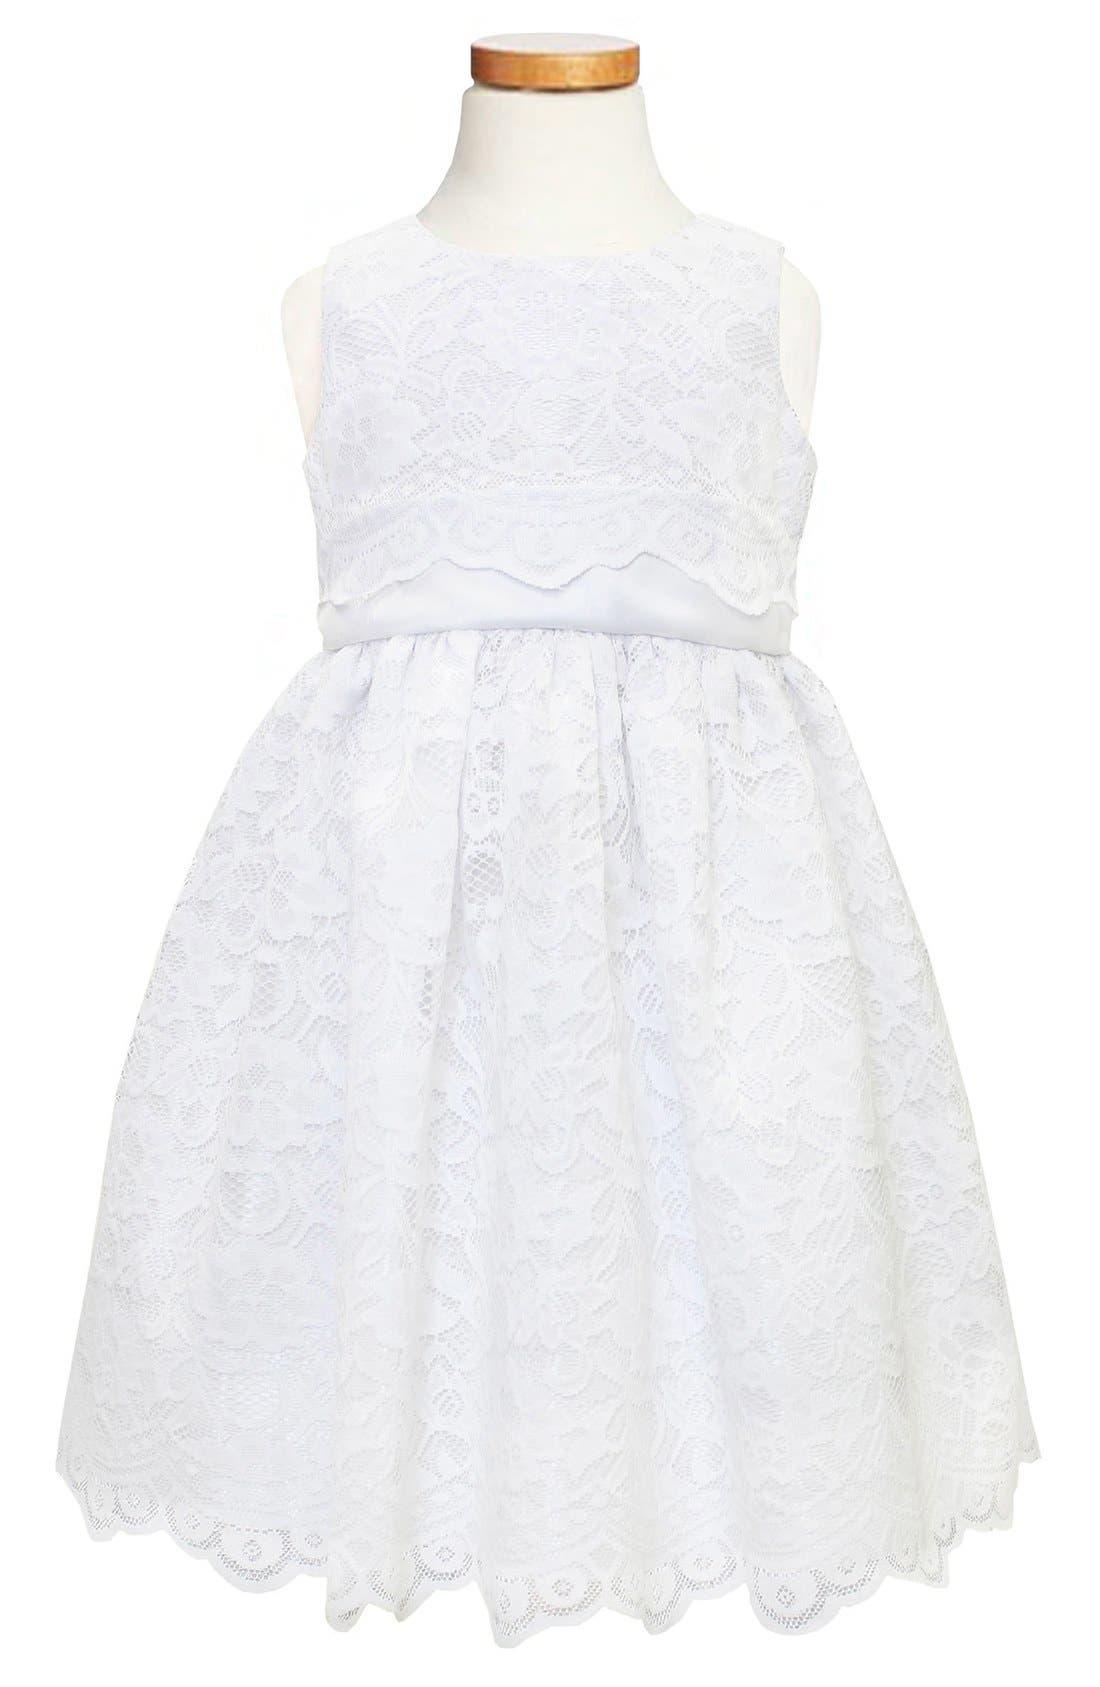 C.I. Castro & Co. Scallop Lace Dress (Big Girls)